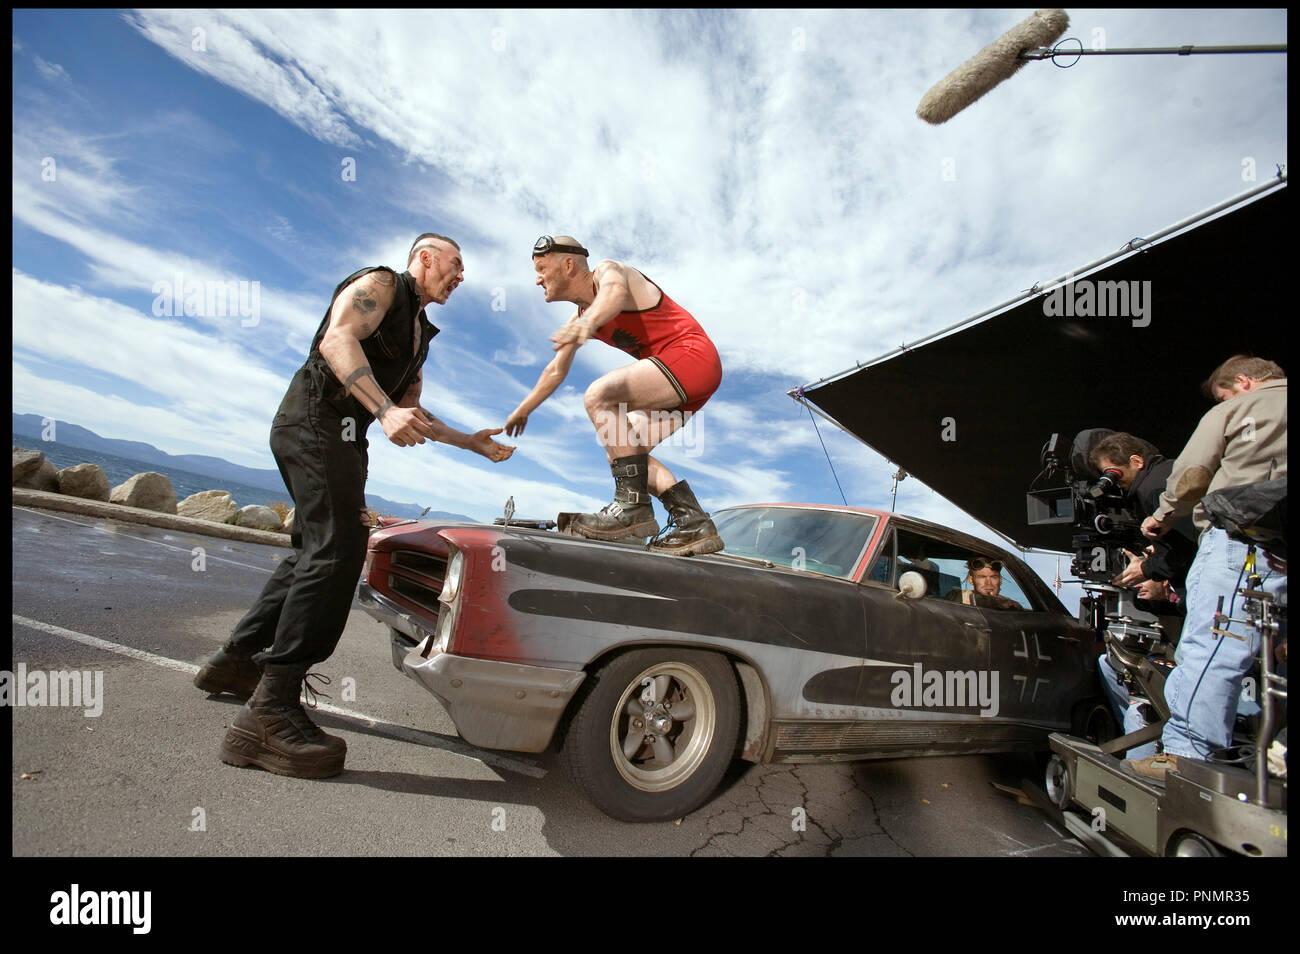 Prod DB ©Working Title - Universal / DR MI$E A PRIX (SMOKIN' ACES) de Joe Carnahan 2007 USA / GB / FRA  avec Kevin Durand, Maury Sterling et Chris Pine sur le tournage - Stock Image